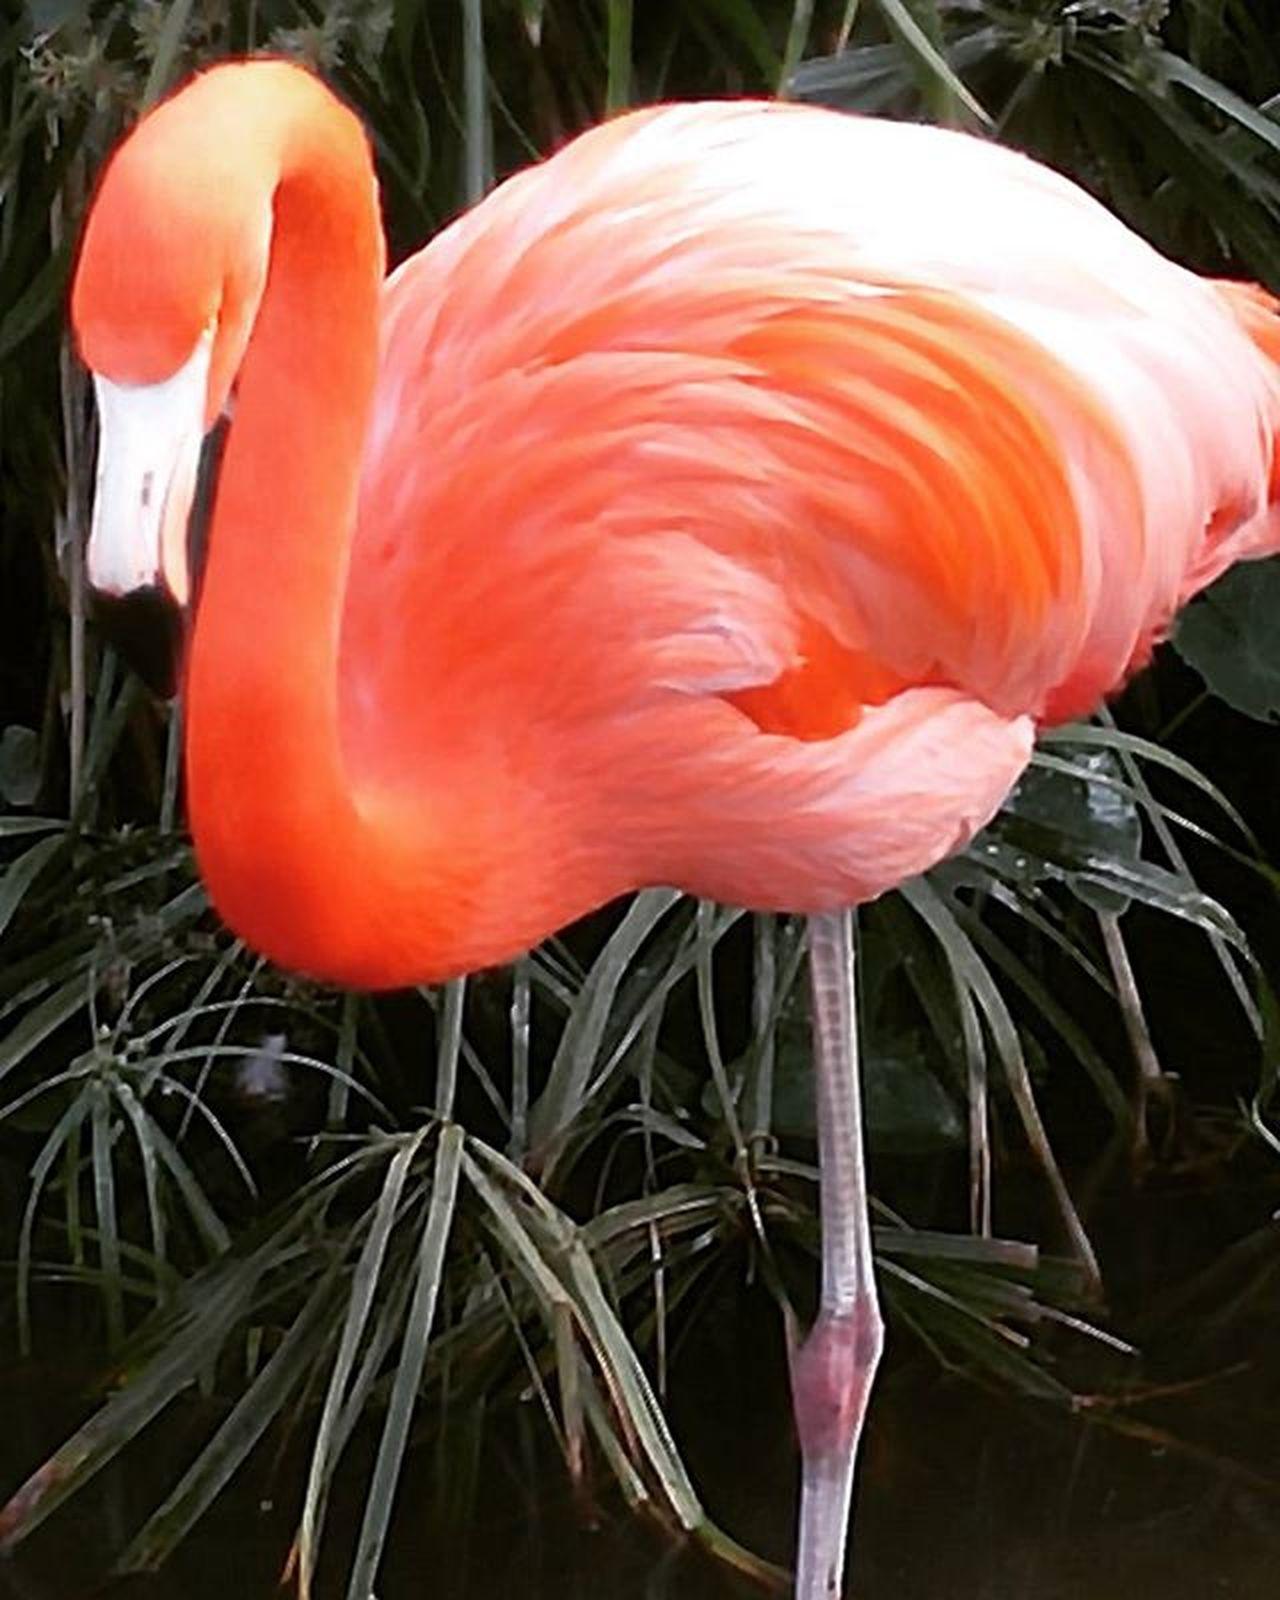 Flamingo Color Contrast Florida Primeshots Igpowerclub Picoftheday Igprimeshots Fiftyshades_of_nature Colorexplosion Photography